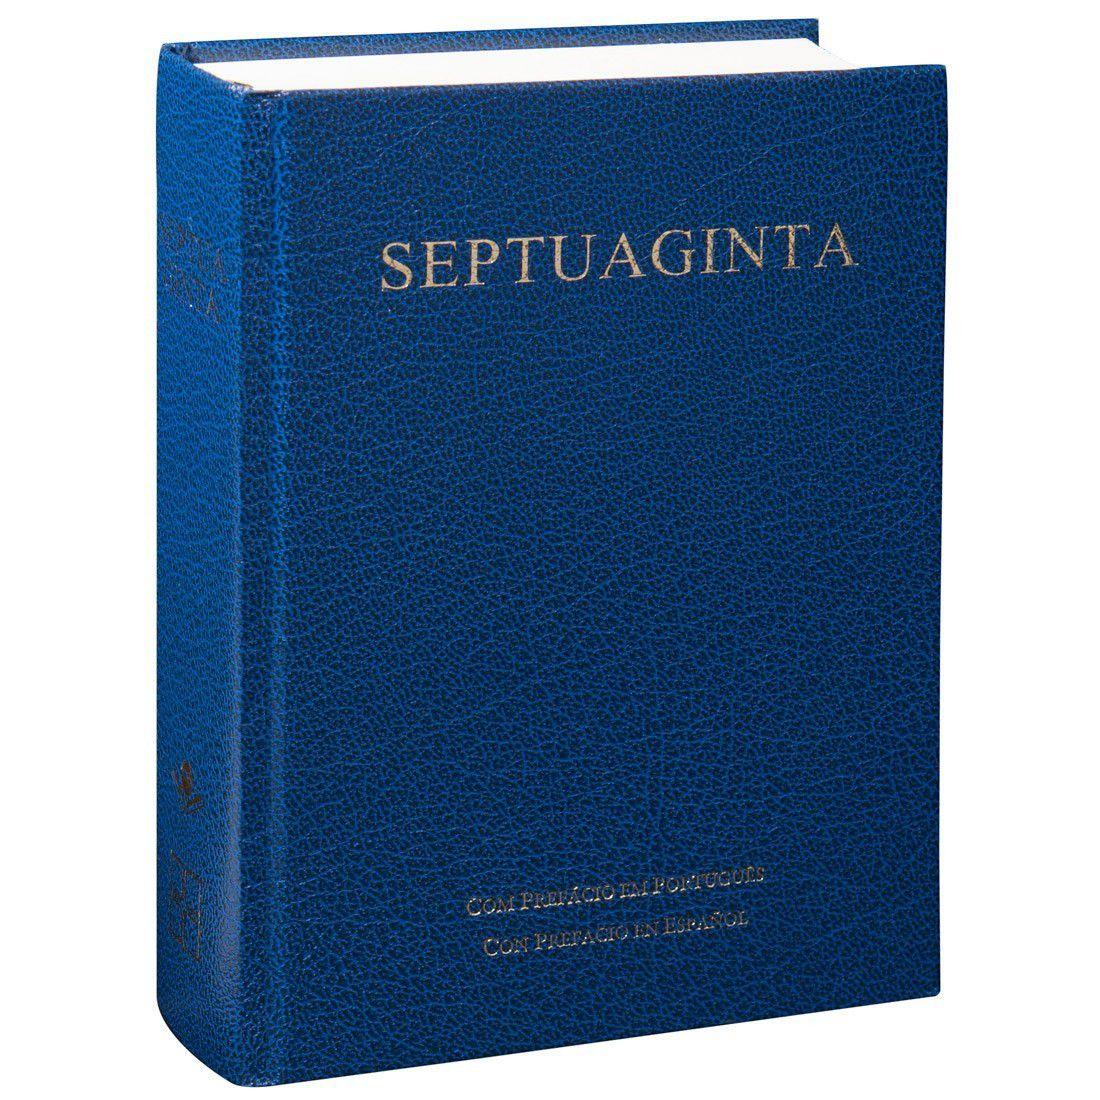 Bíblia Septuaginta